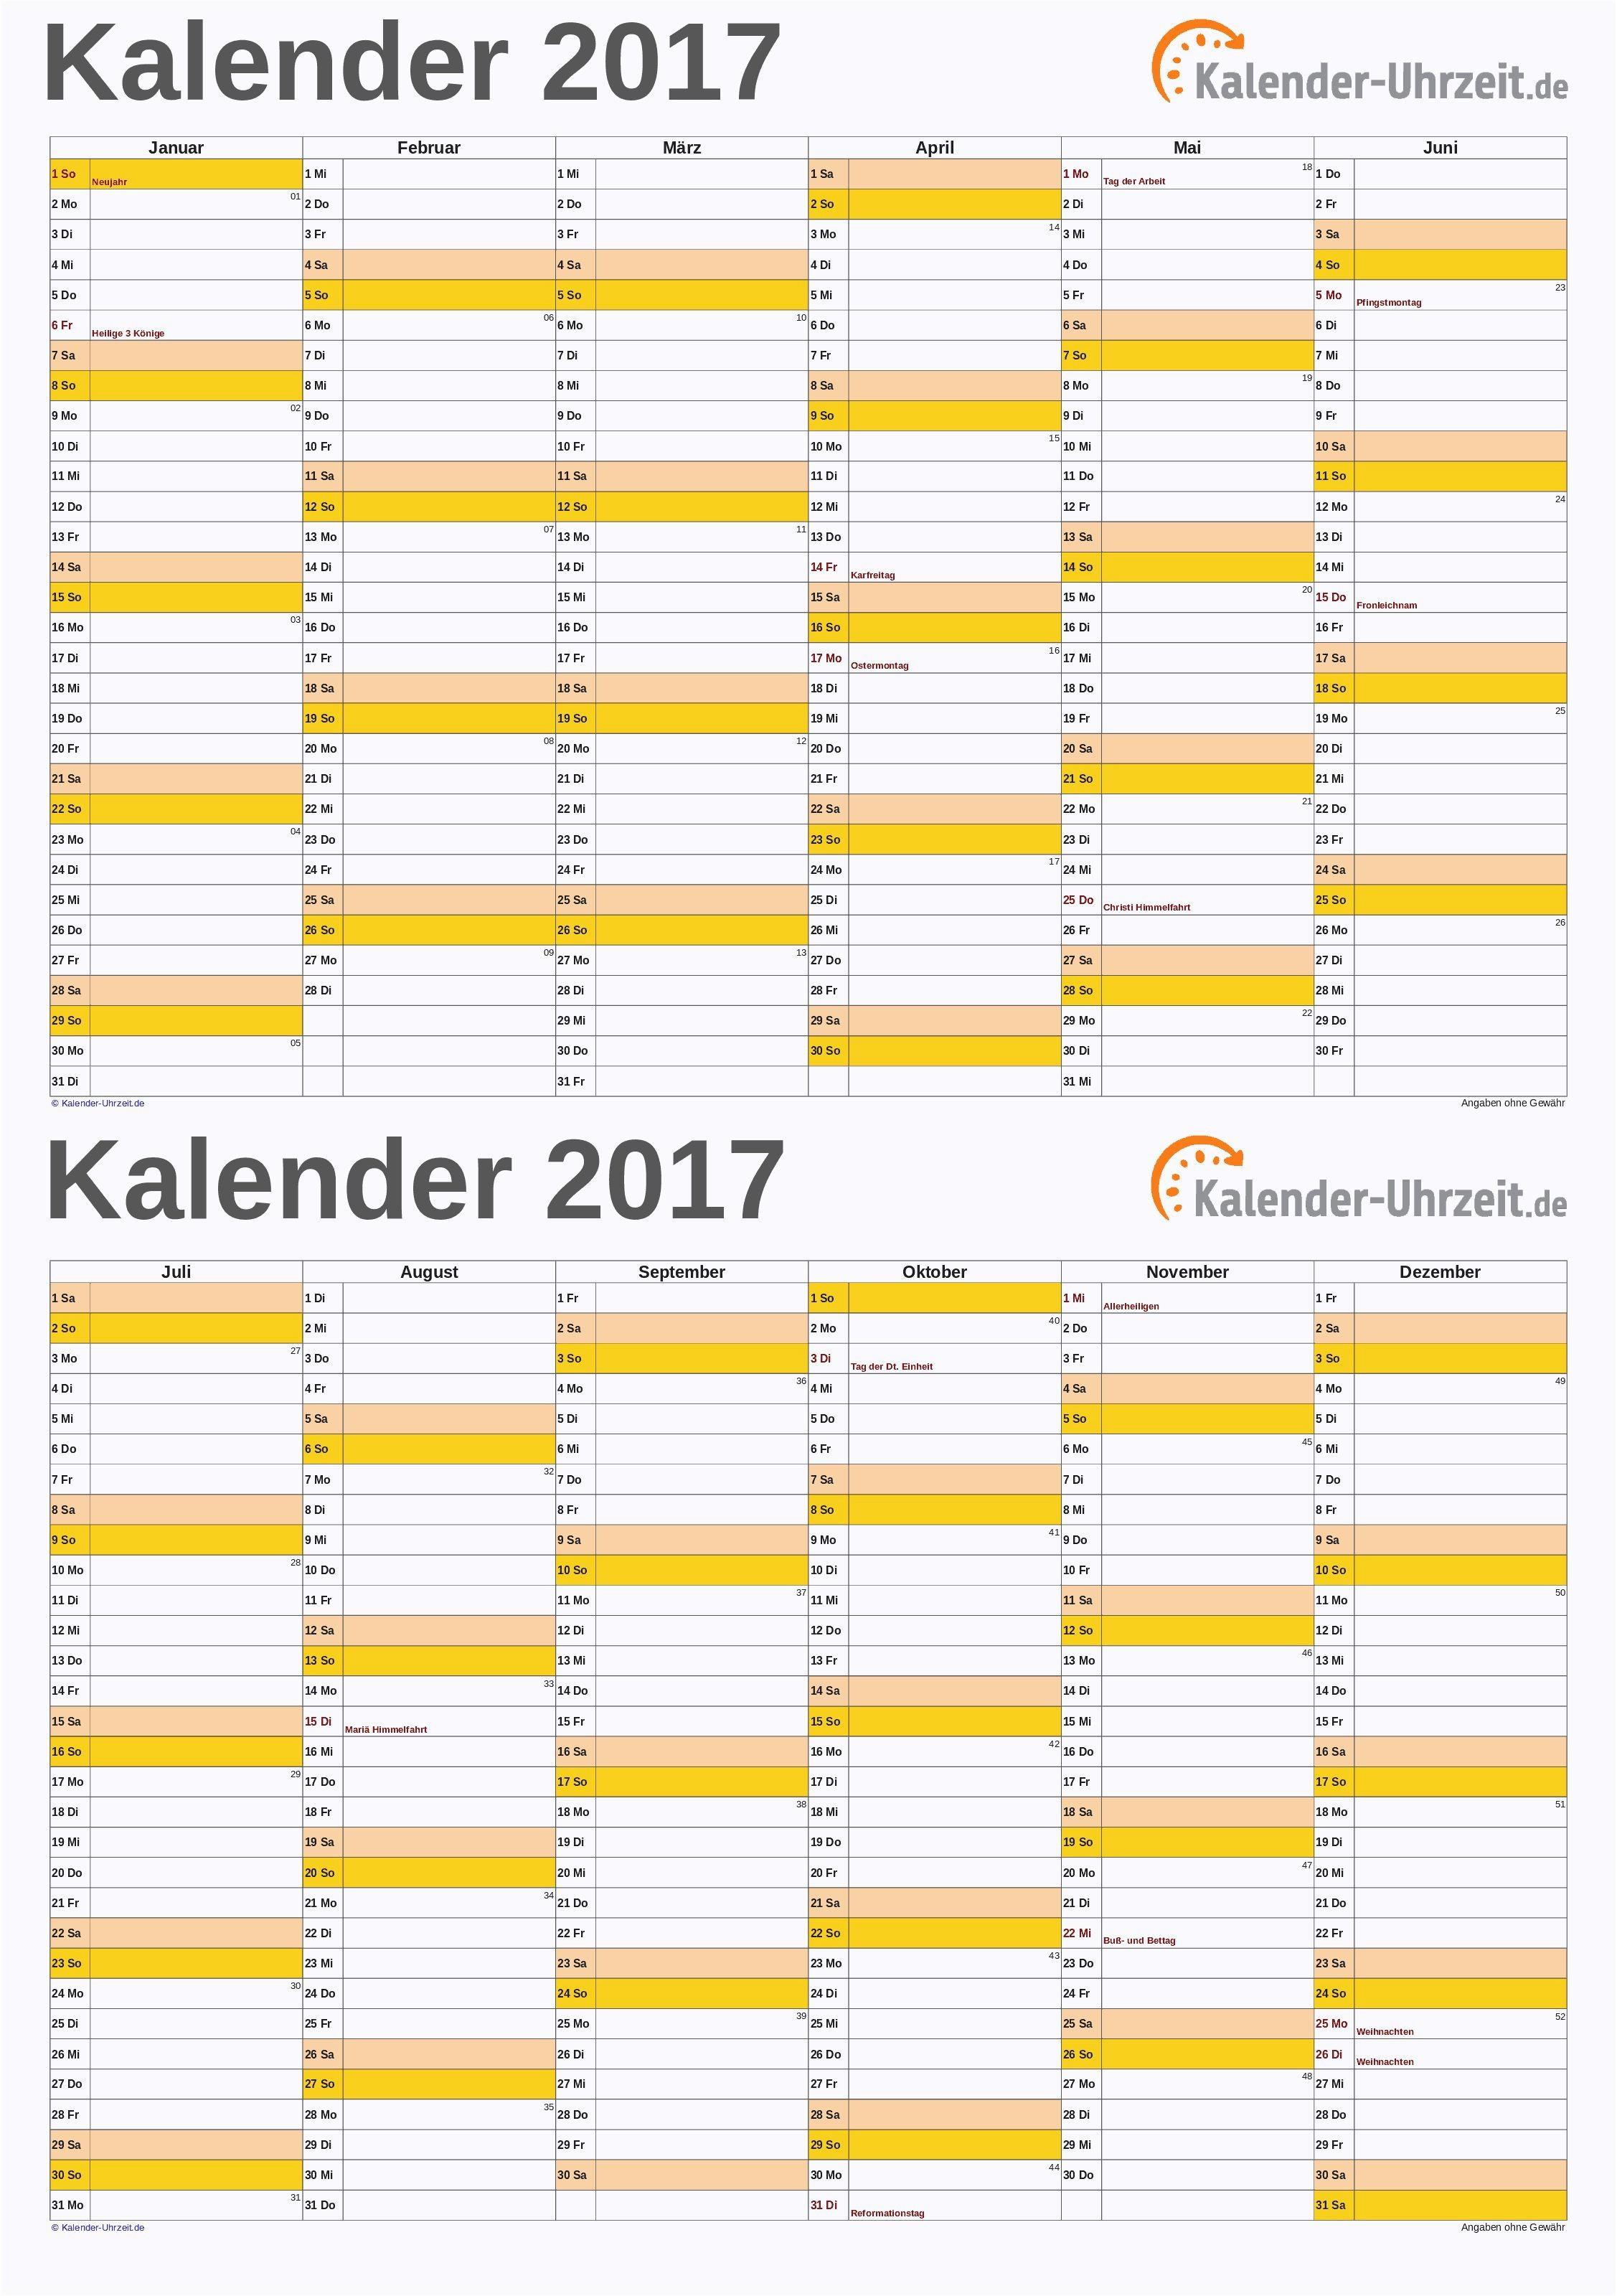 Kalender Tahun 2019 Pdf Recientes 59 Fotografie Von Fotokalender 2017 Zum Ausdrucken Of Kalender Tahun 2019 Pdf Más Recientes Kalender Bilder Drucken